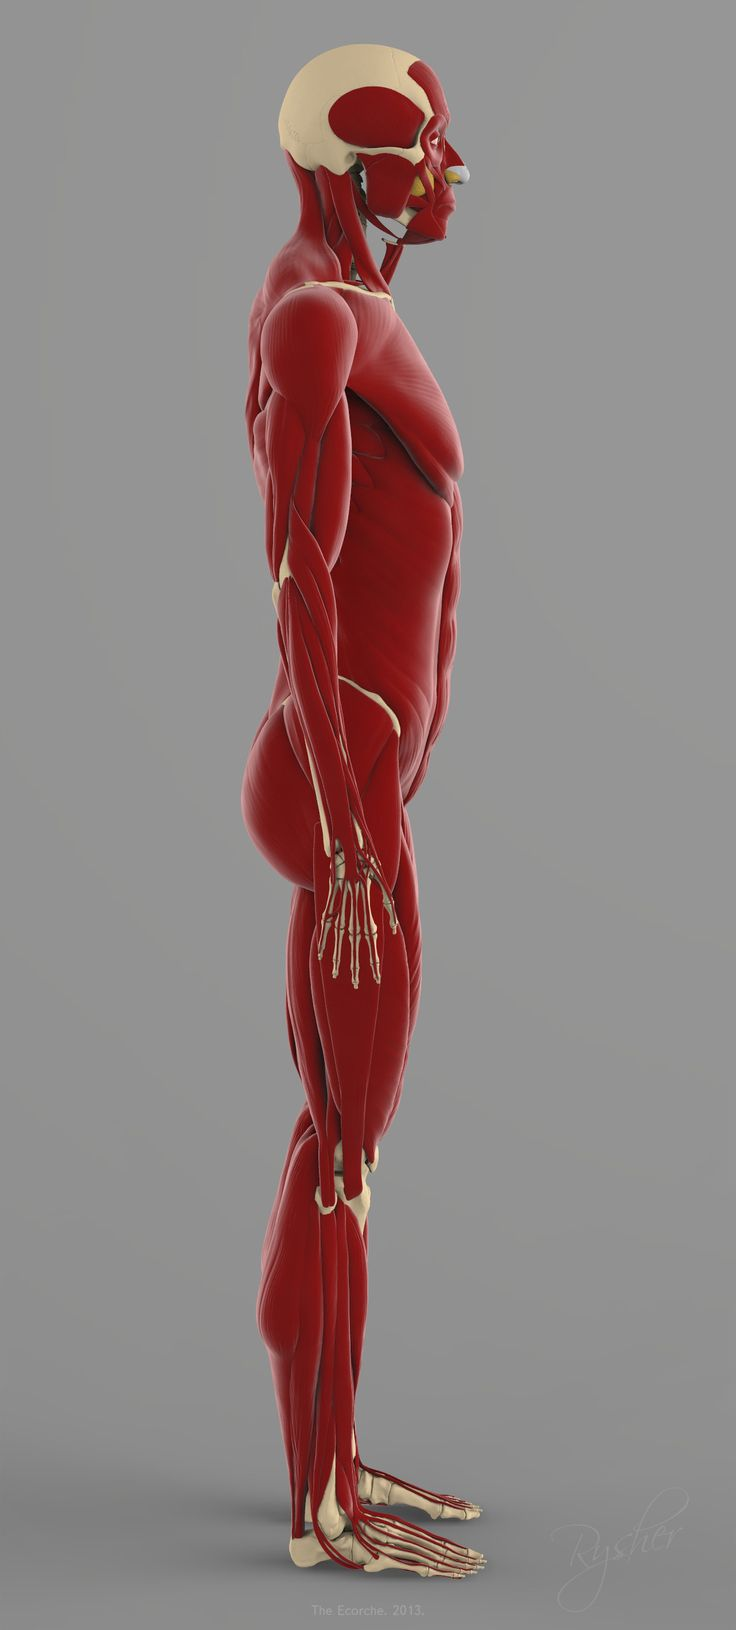 25+ best ideas about Skeleton Muscles on Pinterest ...